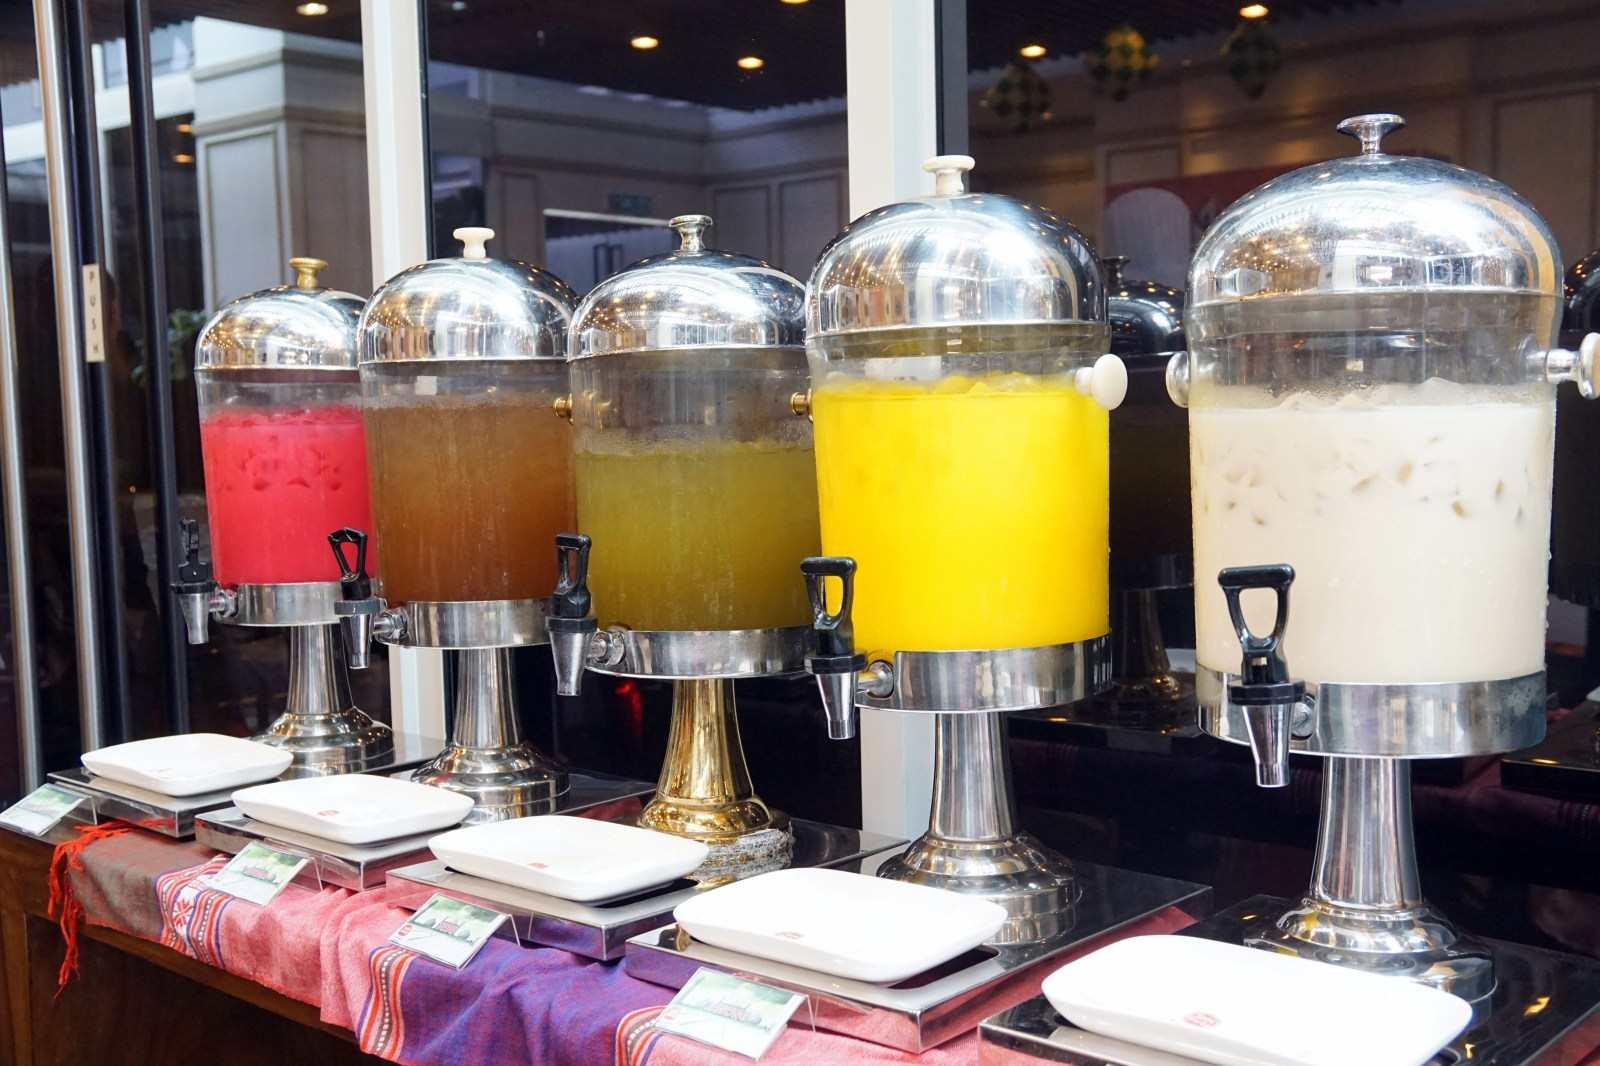 7-luu-y-khi-lua-chon-hinh-thuc-to-chuc-tiec-cuoi-buffet-4